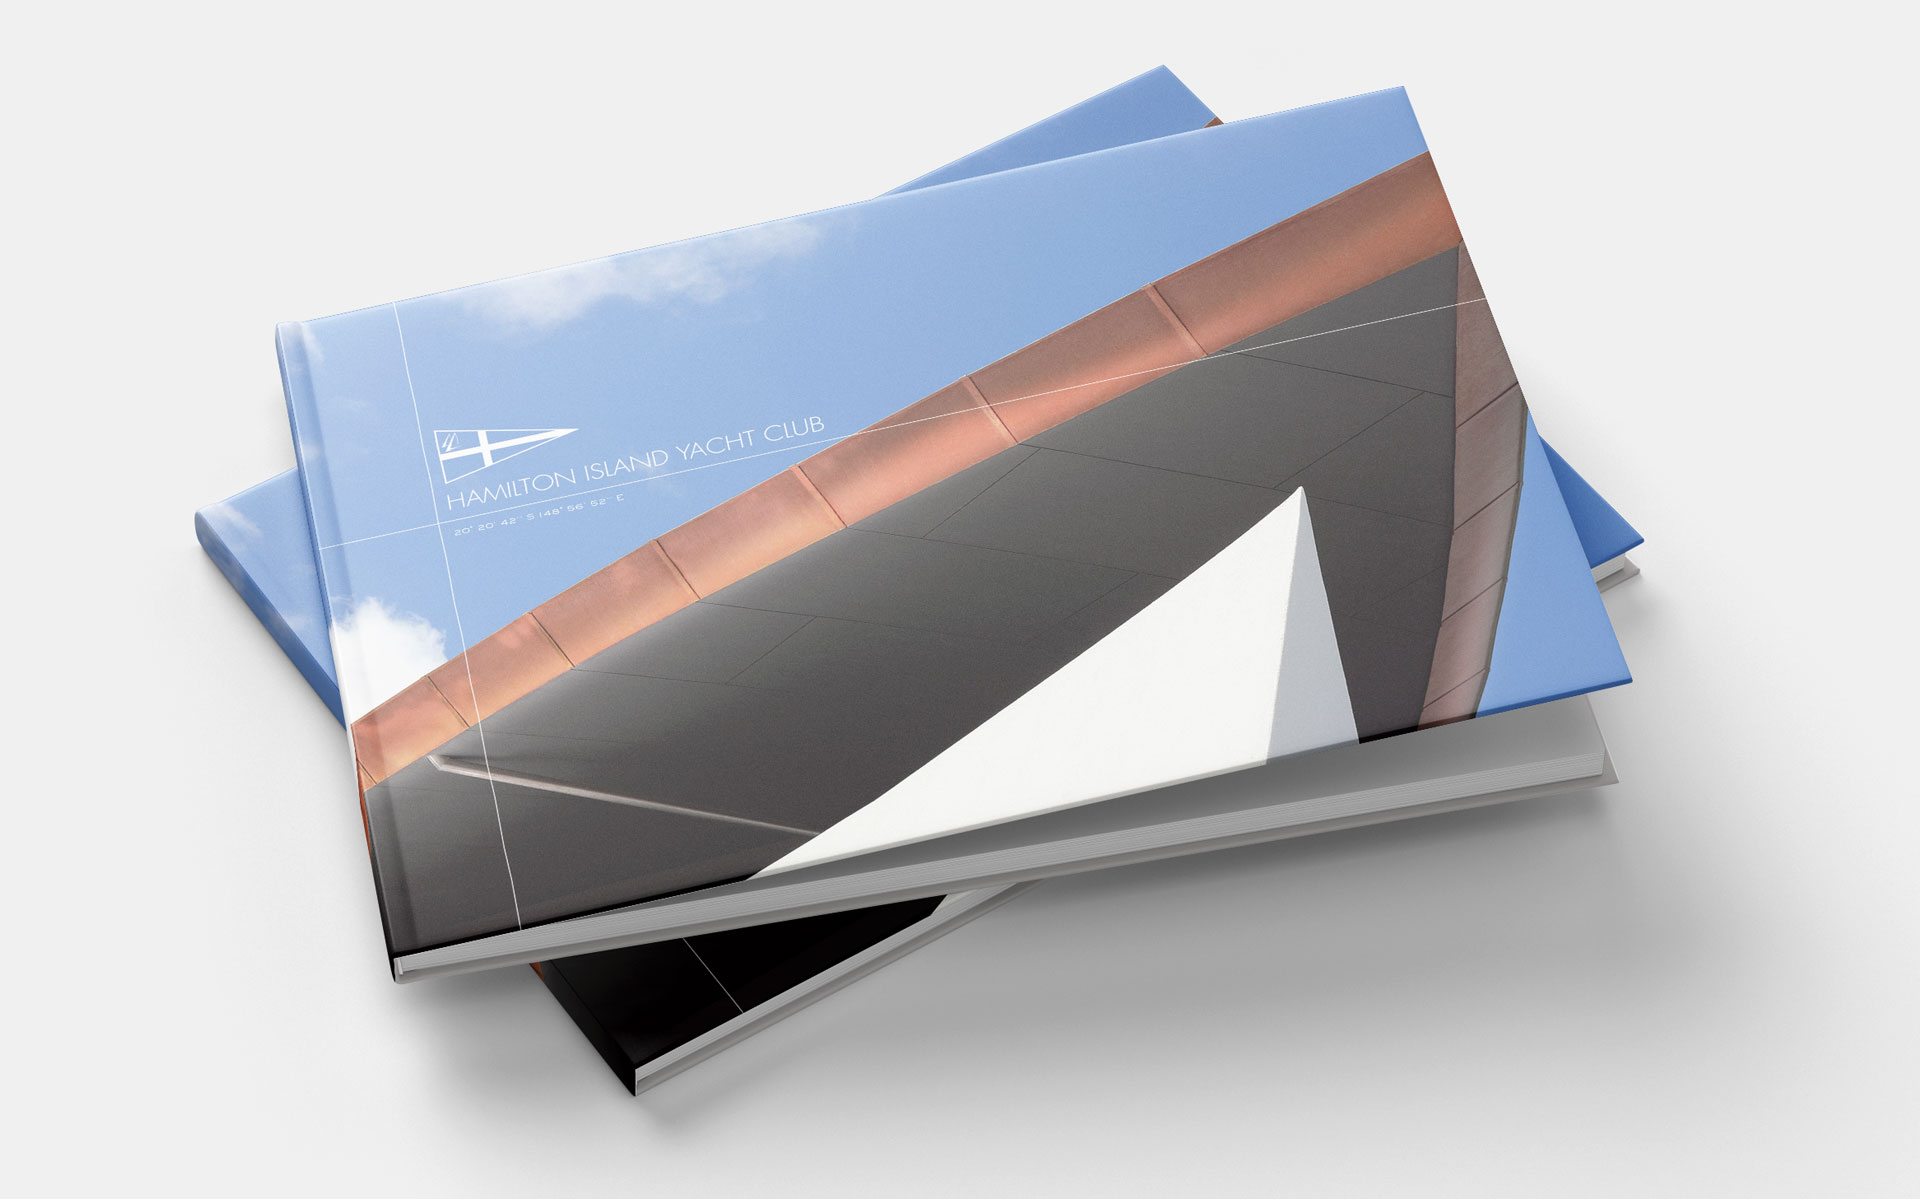 Hamilton Island marketing, advertising, publications & events designed by Amy Howard